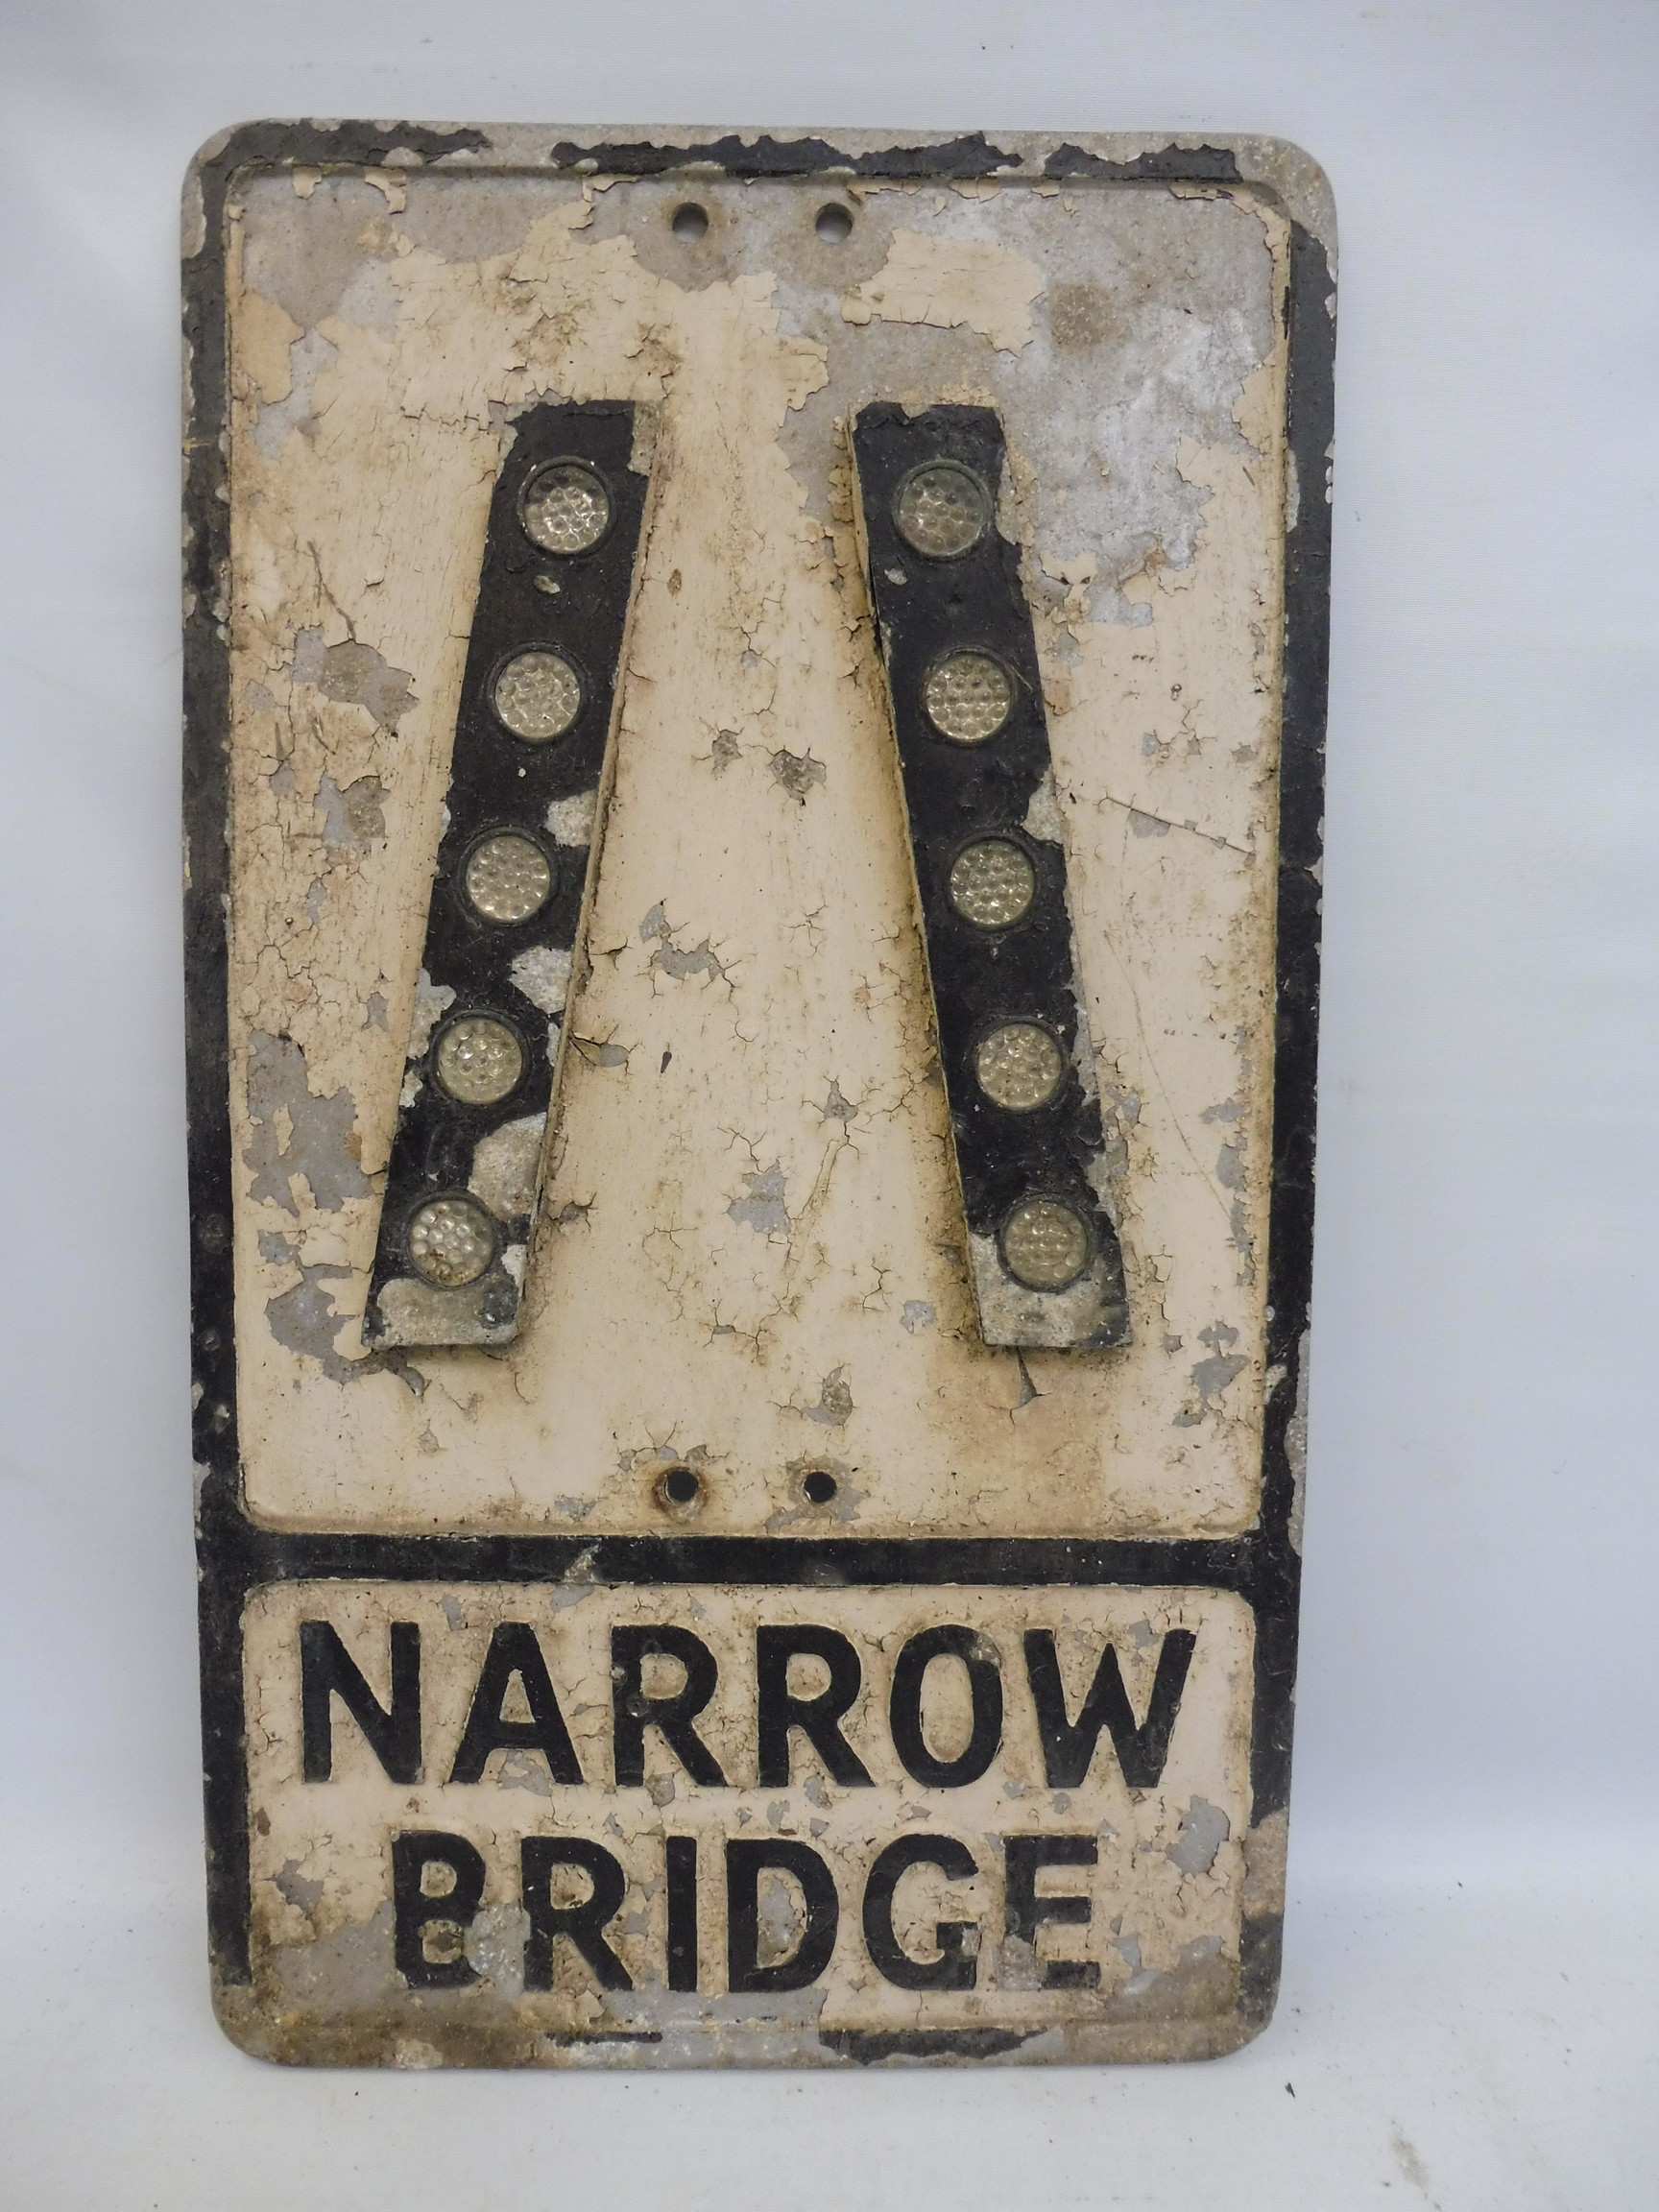 "An aluminum road sign - Narrow Bridge with glass reflective discs, 12 x 21""."